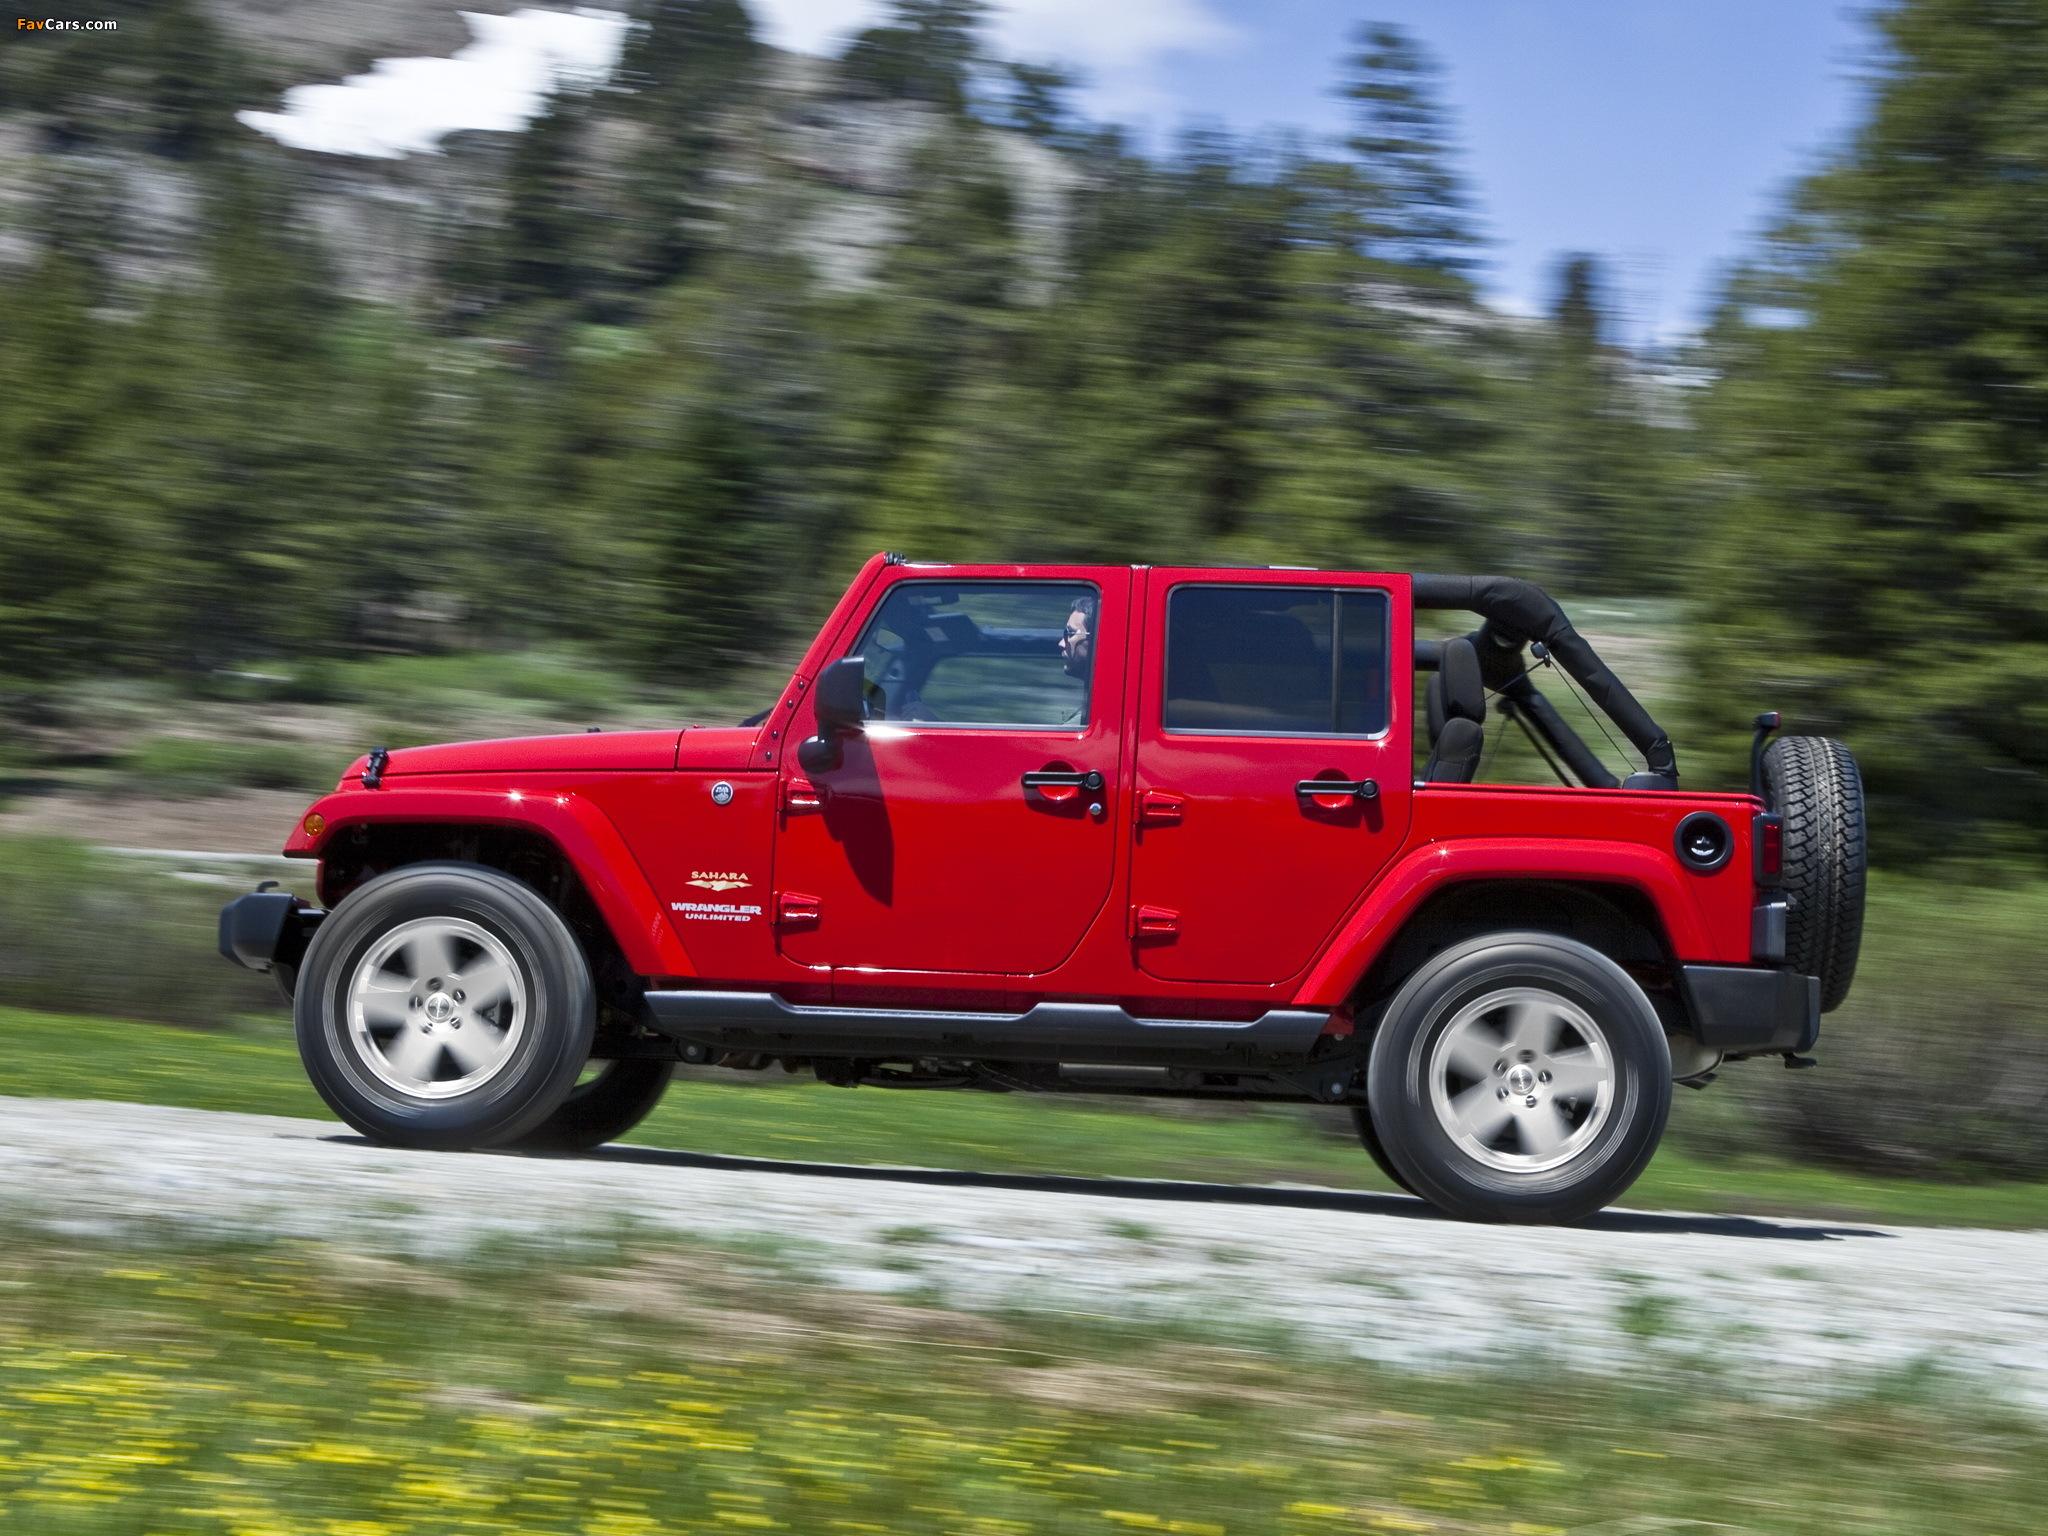 Jeep Wrangler Unlimited Sahara (JK) 2010 pictures (2048 x 1536)